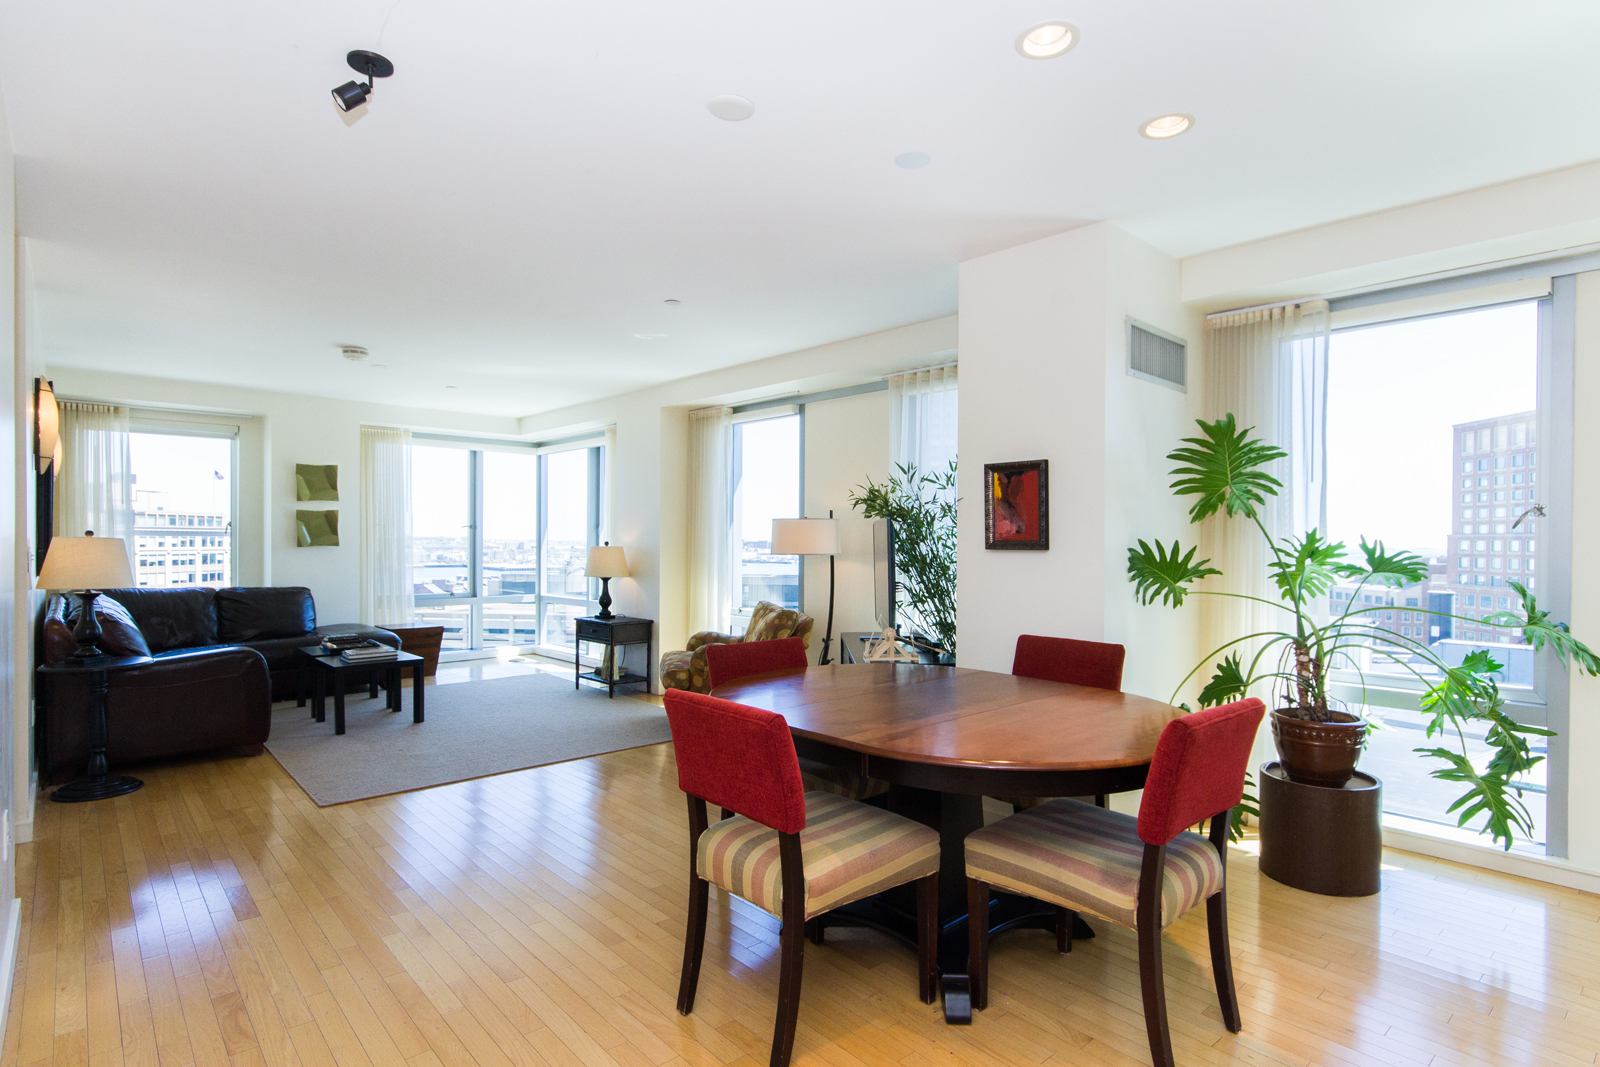 Кооперативная квартира для того Продажа на Highly Sought After Luxury Building 80 Broad Street PH 1203 Waterfront, Boston, Массачусетс, 02110 Соединенные Штаты